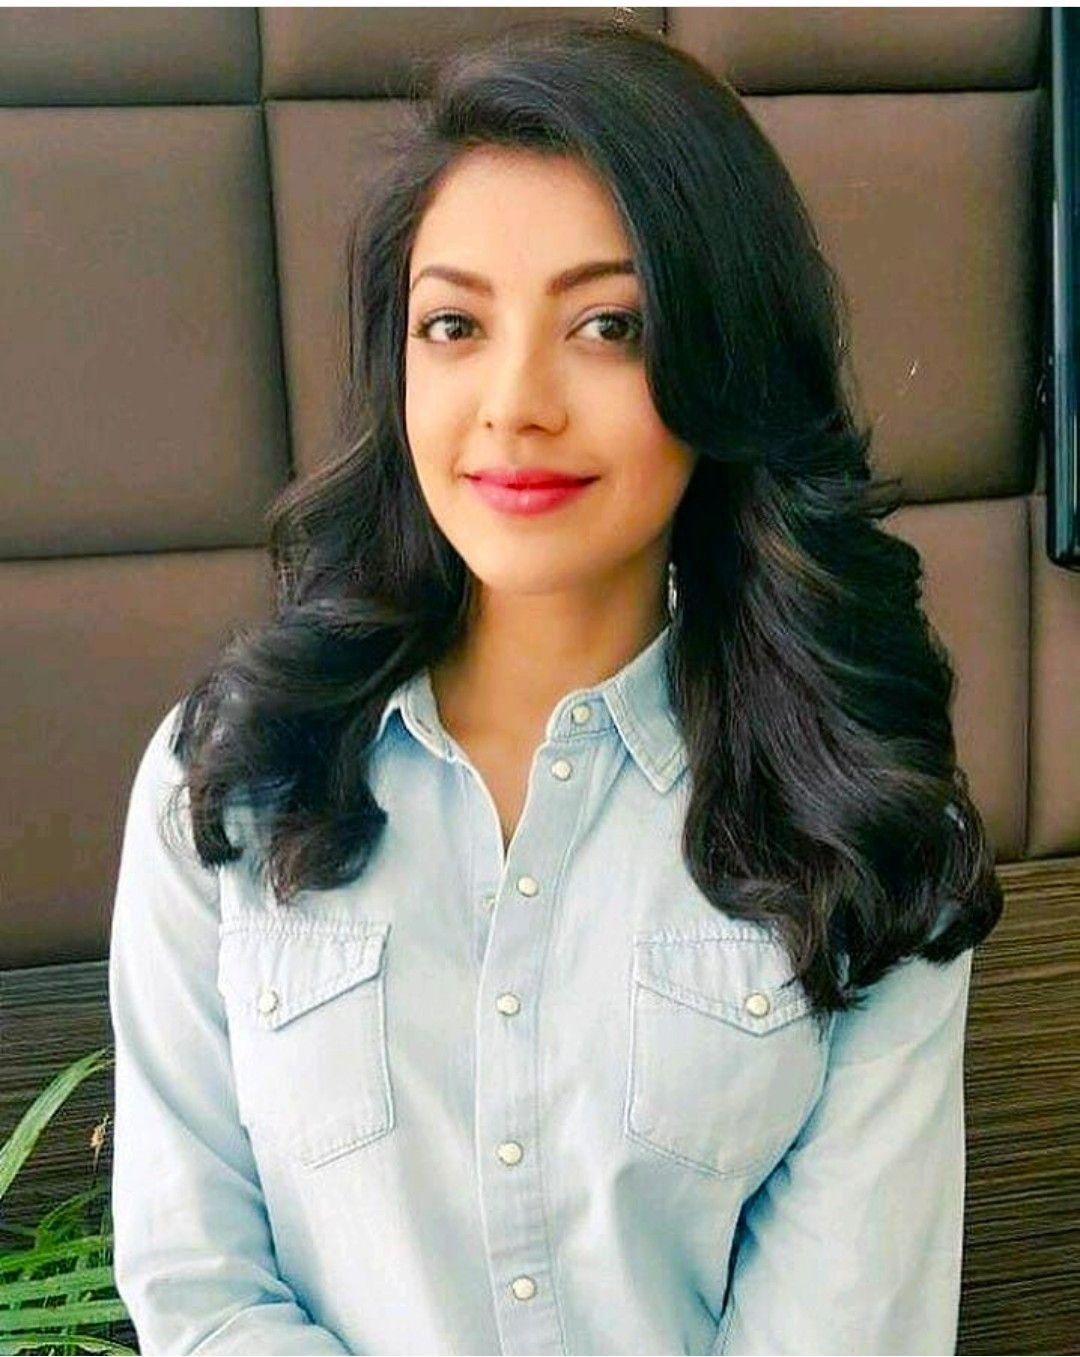 Kajal Aggarwal Latest Hot Hd Photos Wallpapers 1080p 4k 4563 Kajalaggarwal In 2020 South Indian Actress Indian Actresses Most Beautiful Indian Actress